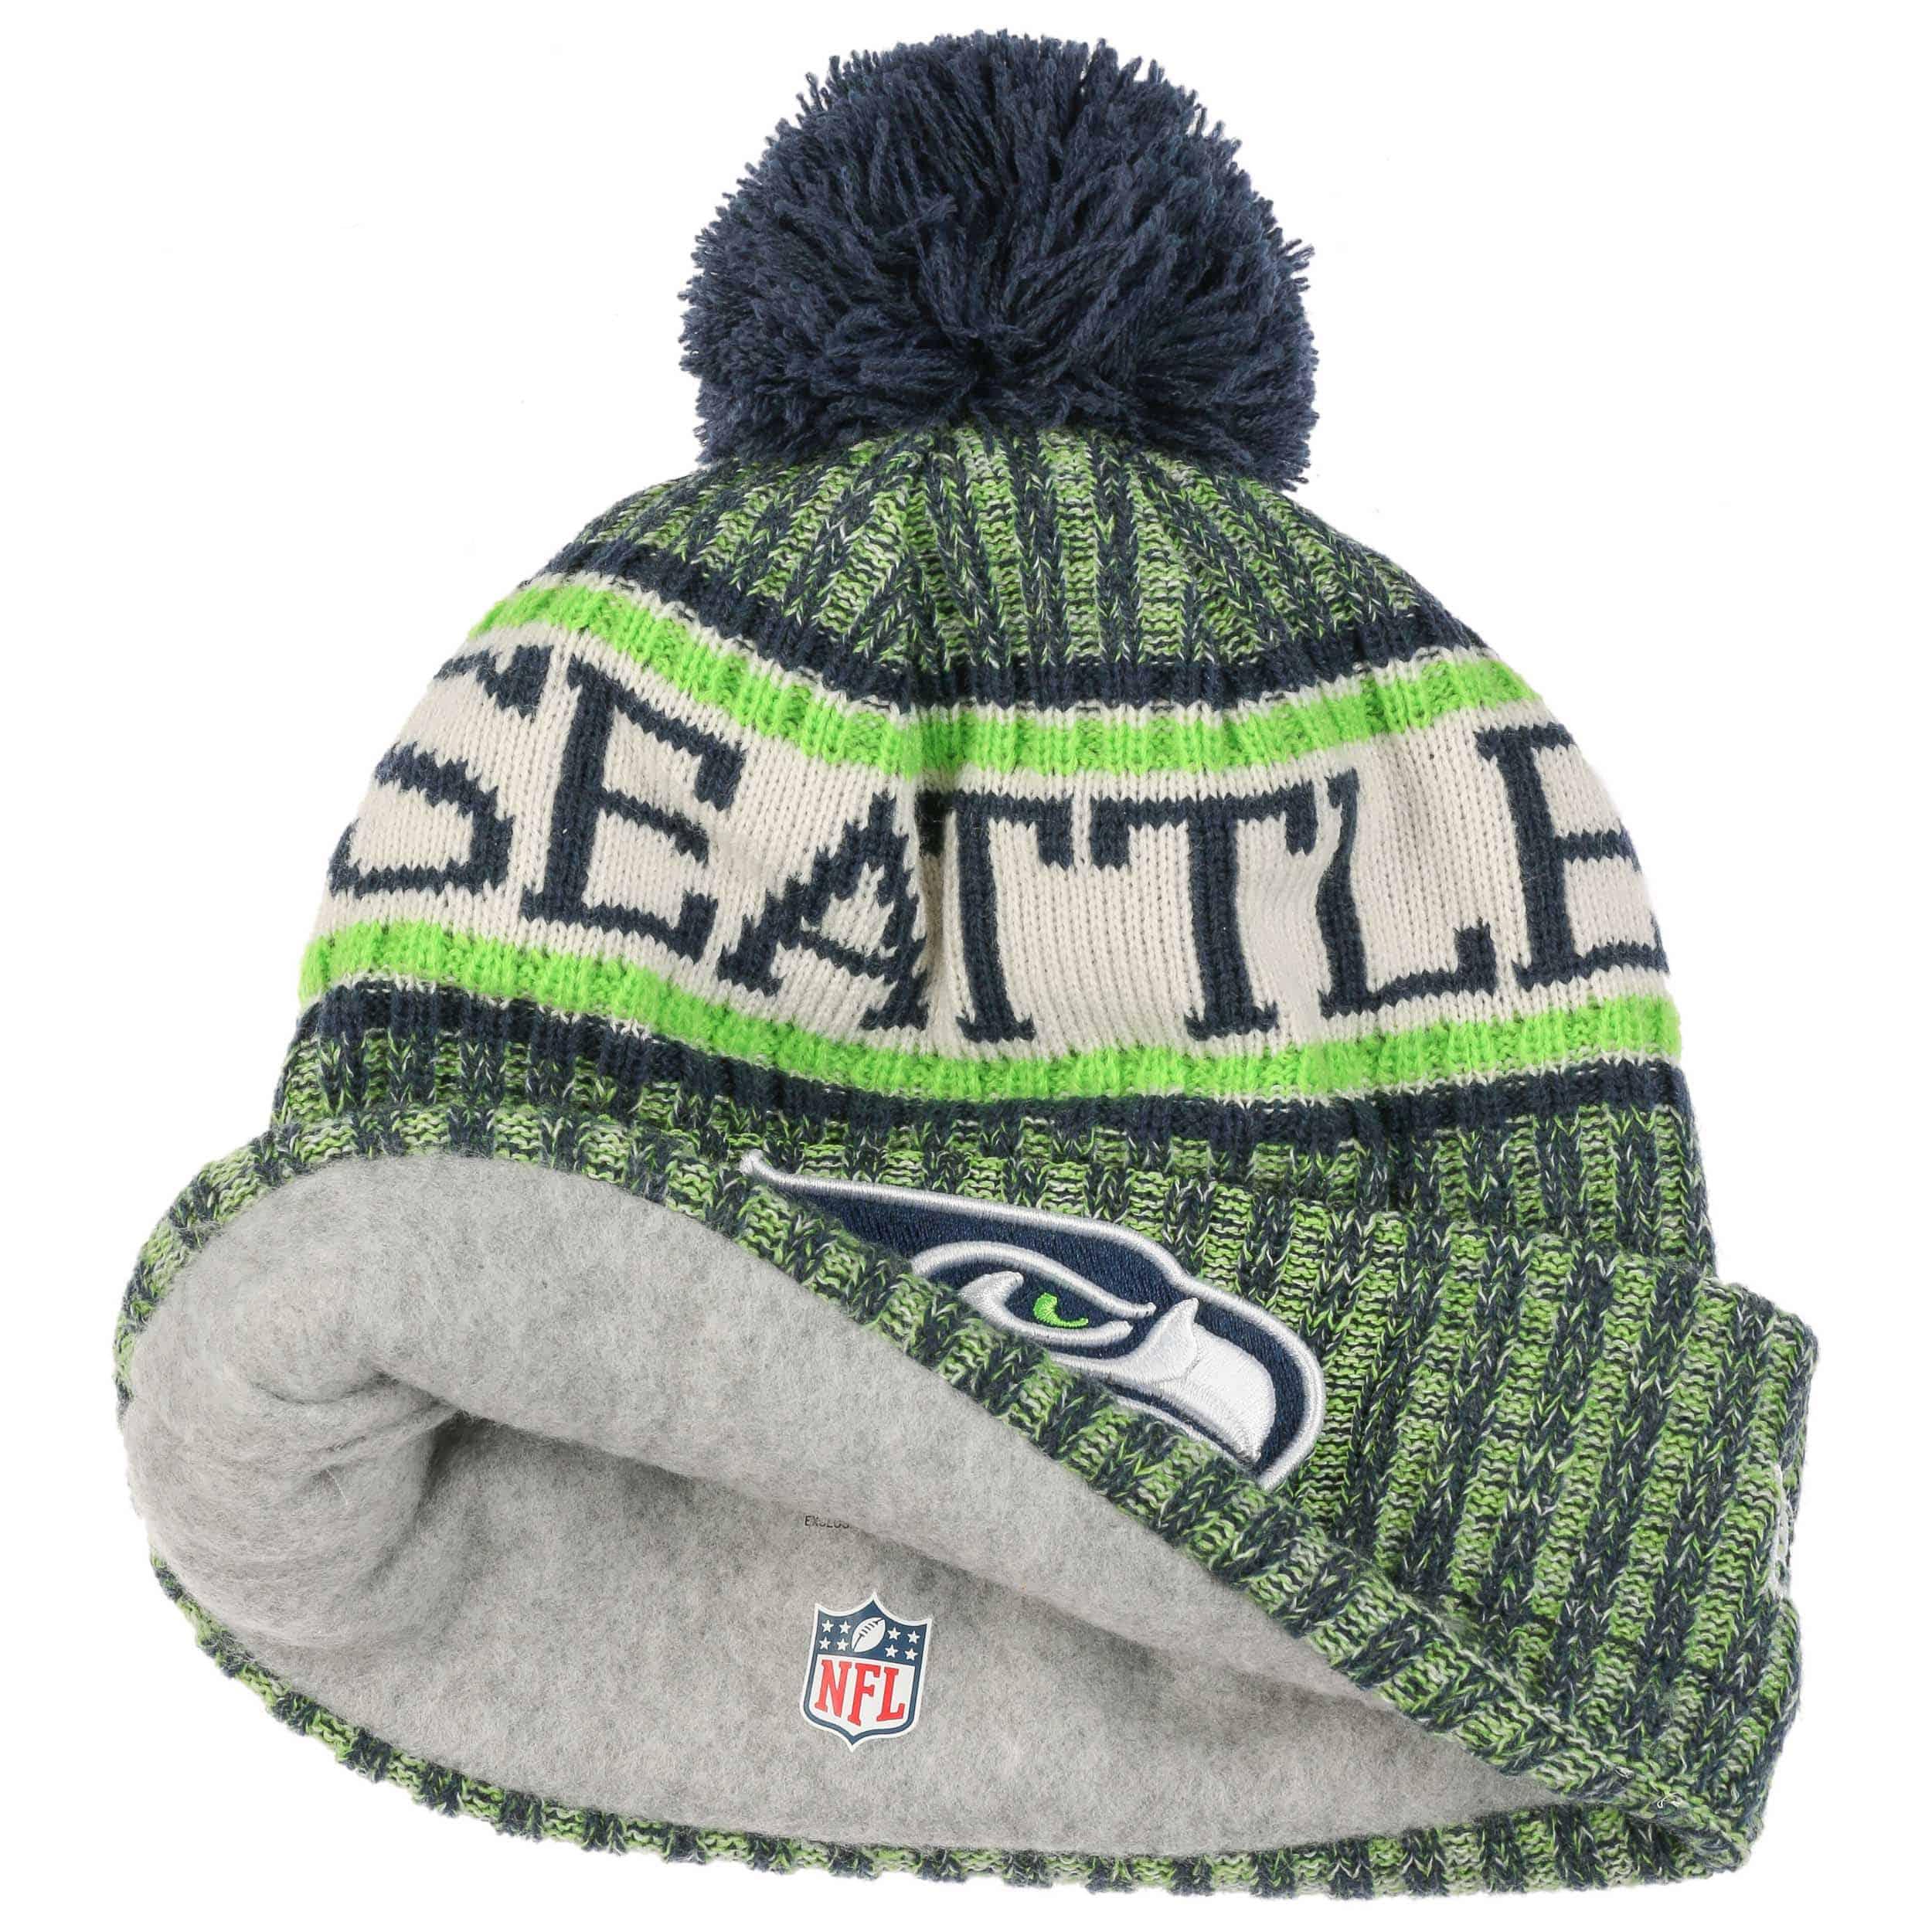 0017f4dbd63 On-Field 18 Seahawks Beanie Hat by New Era - green 1 ...